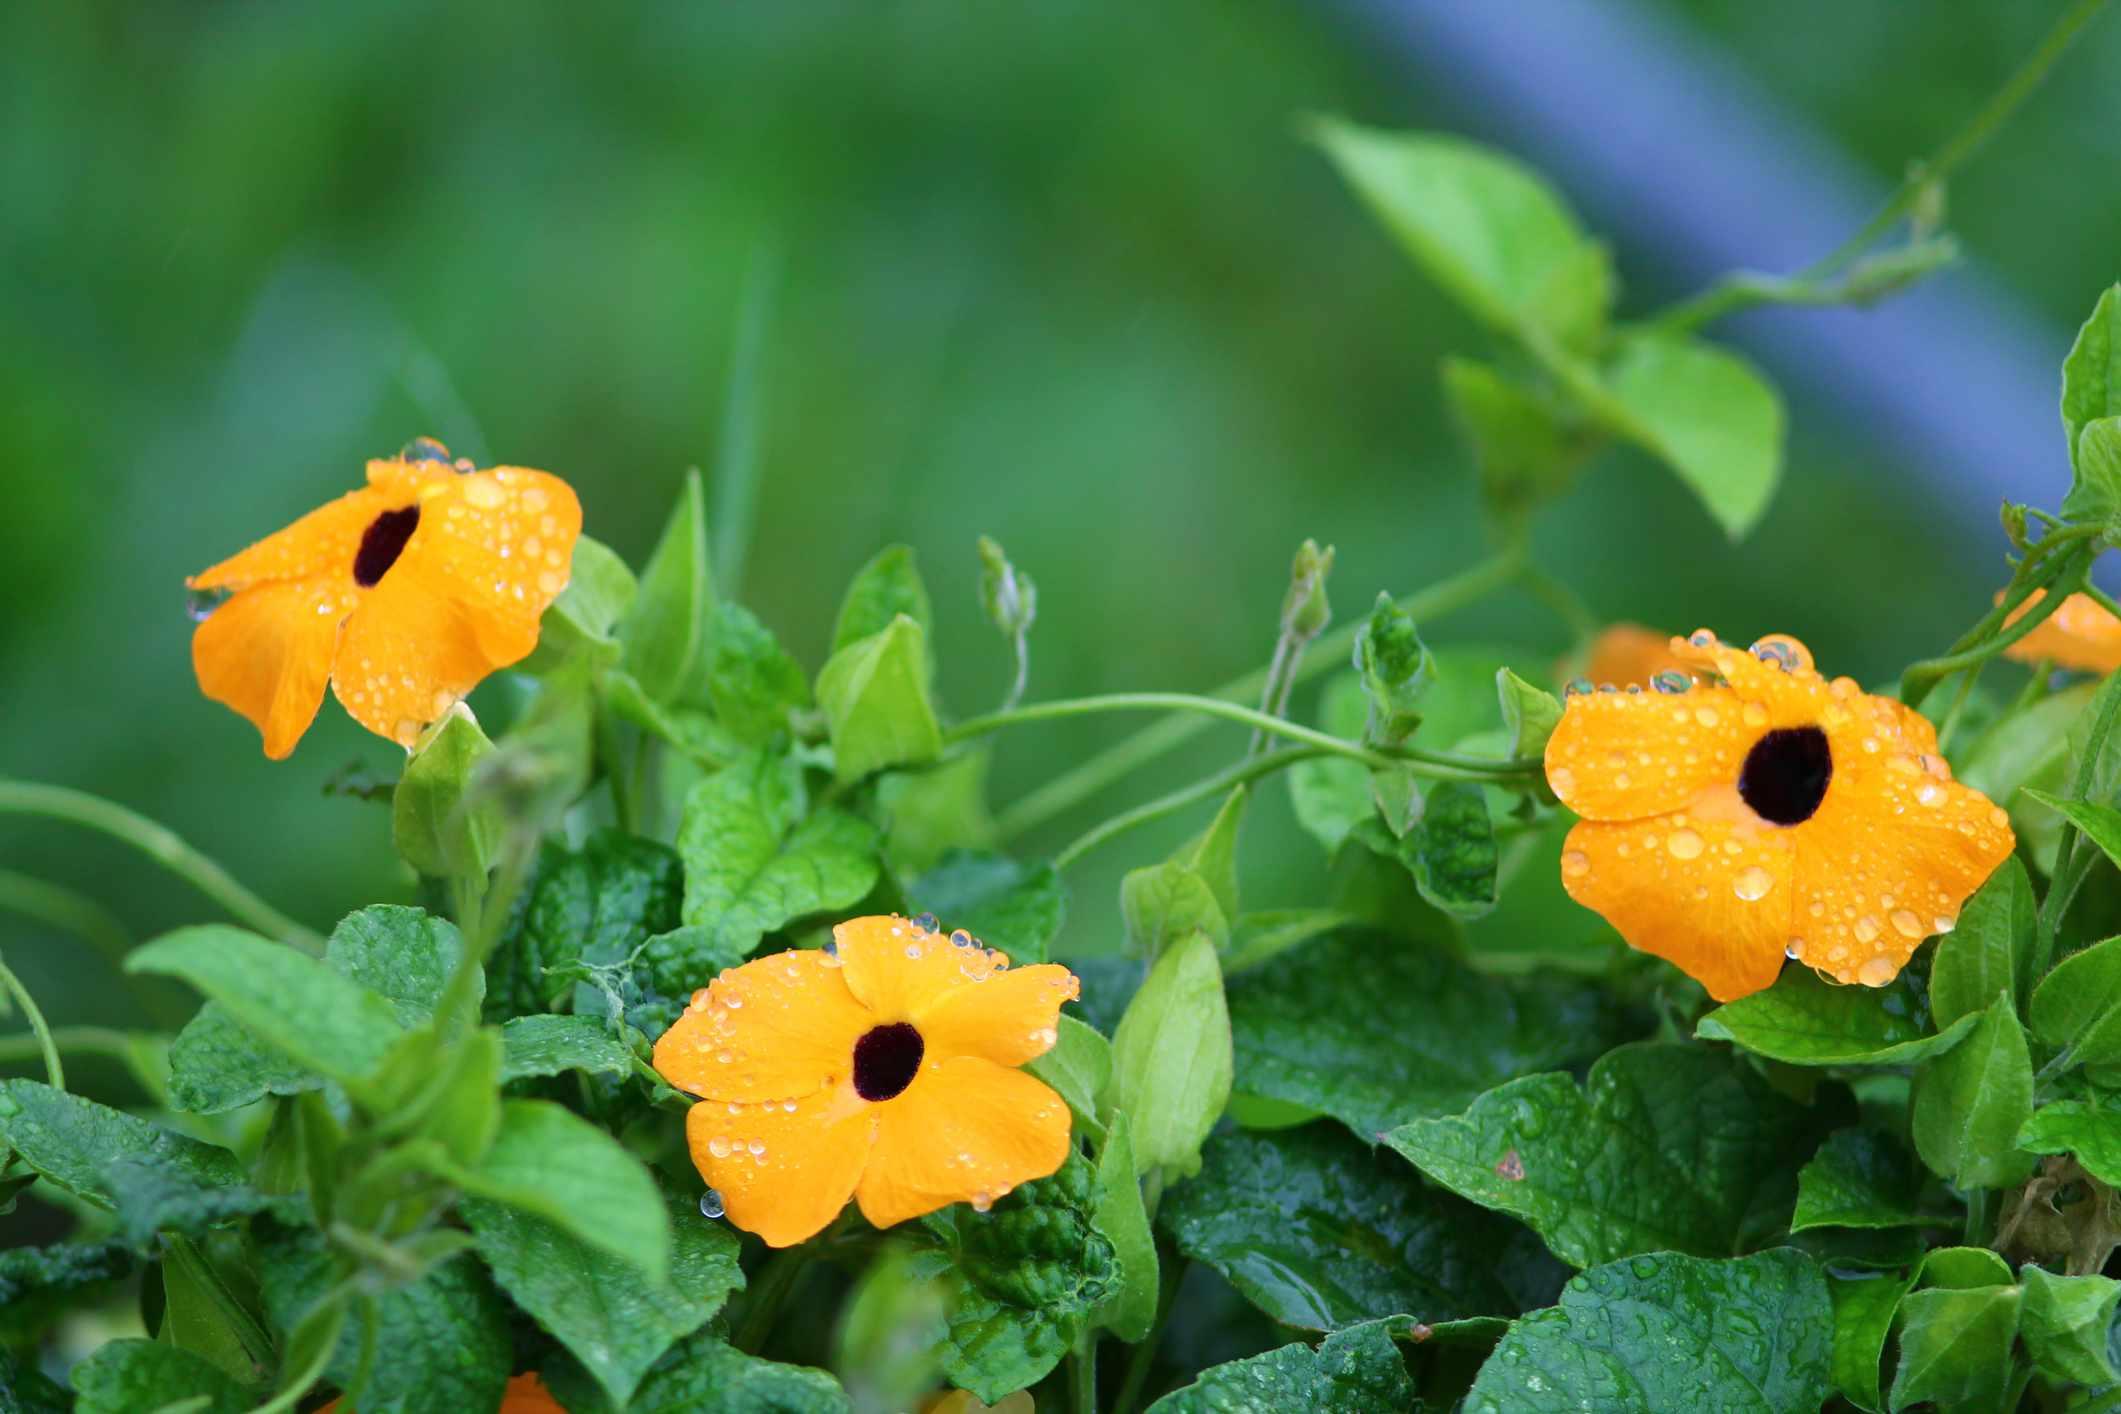 yellow thunbergia alata